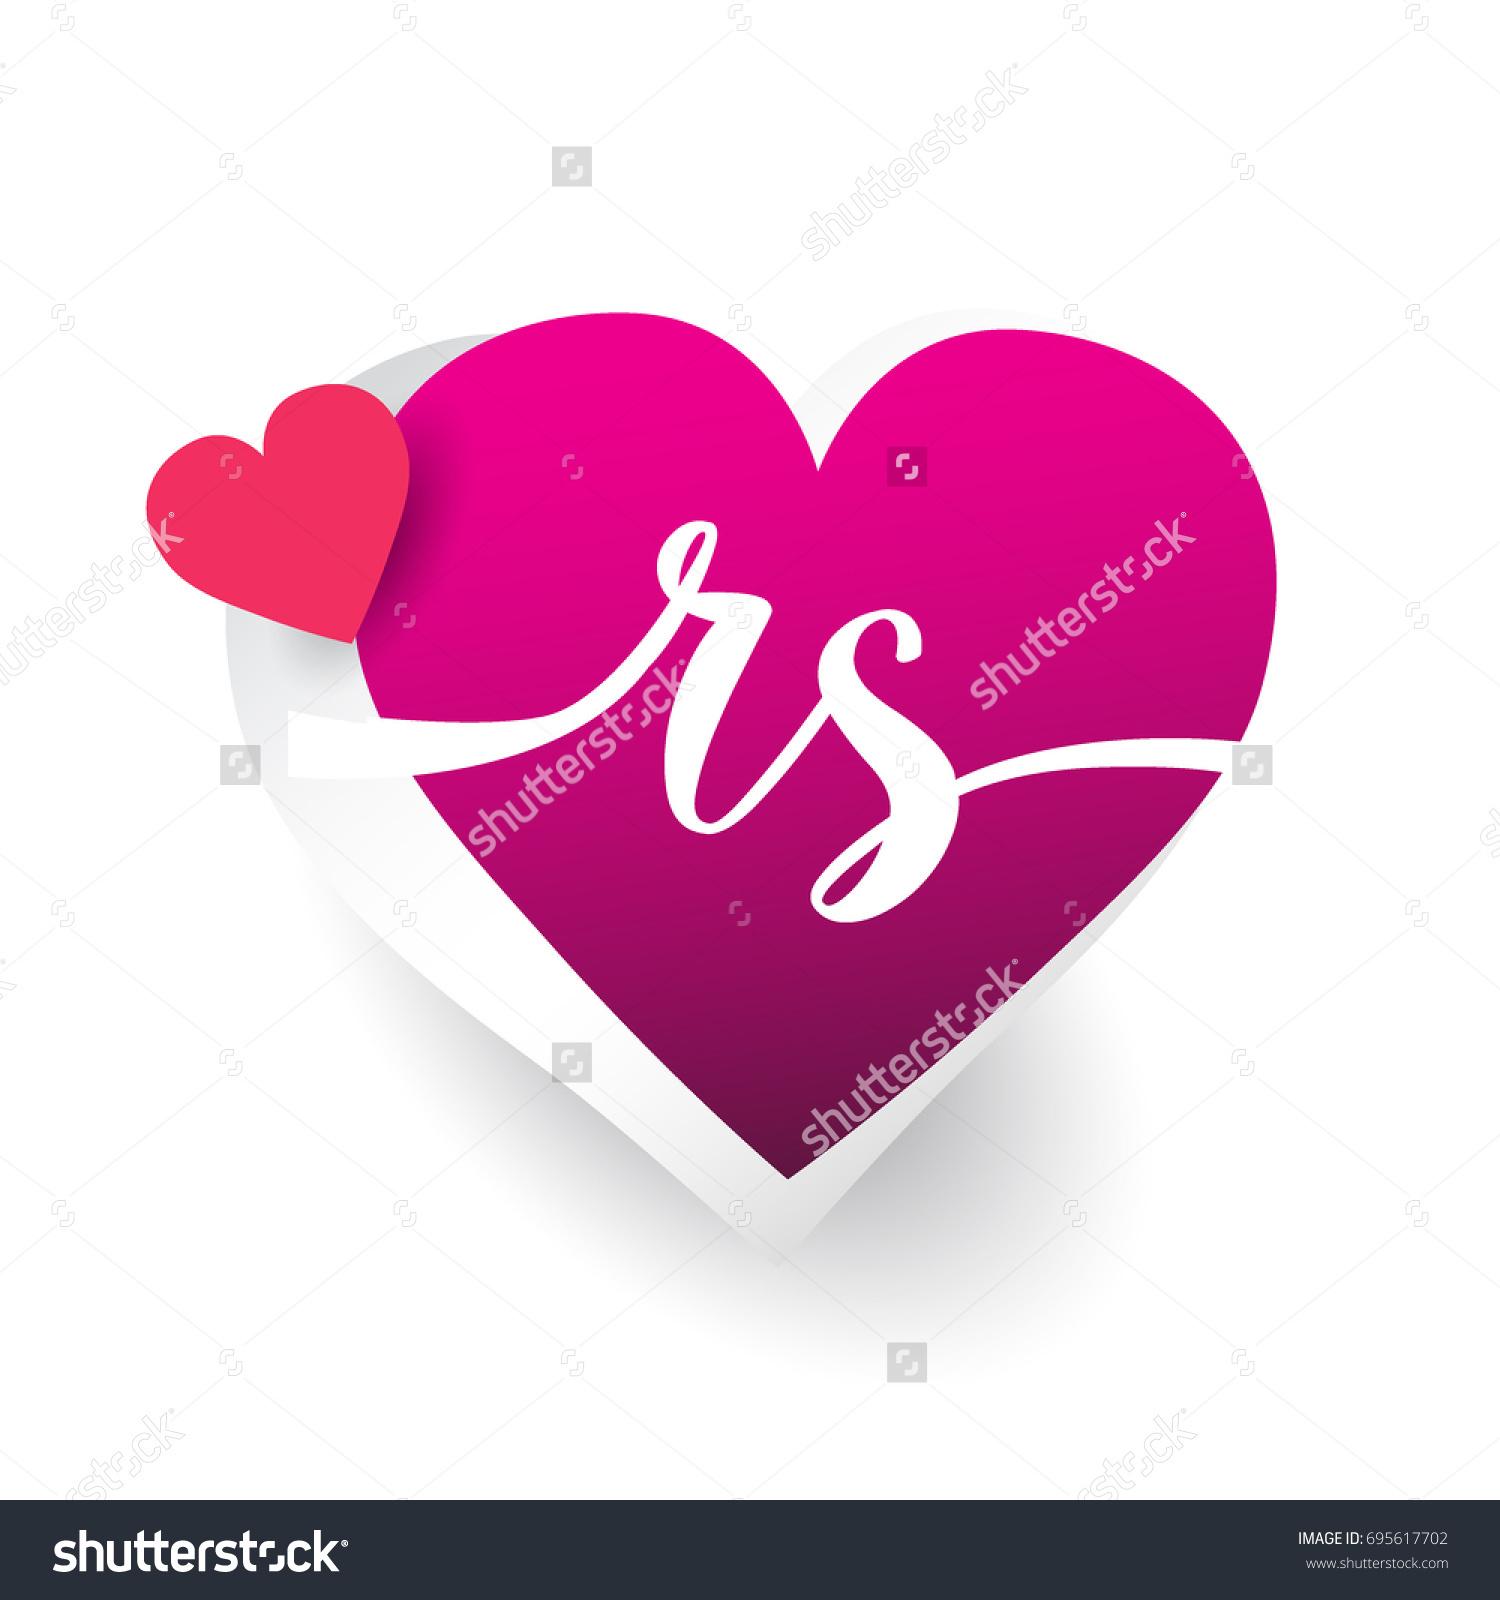 rs love photos  Initial Logo Letter RS Heart Shape Stock Vector 695617702 - Shutterstock